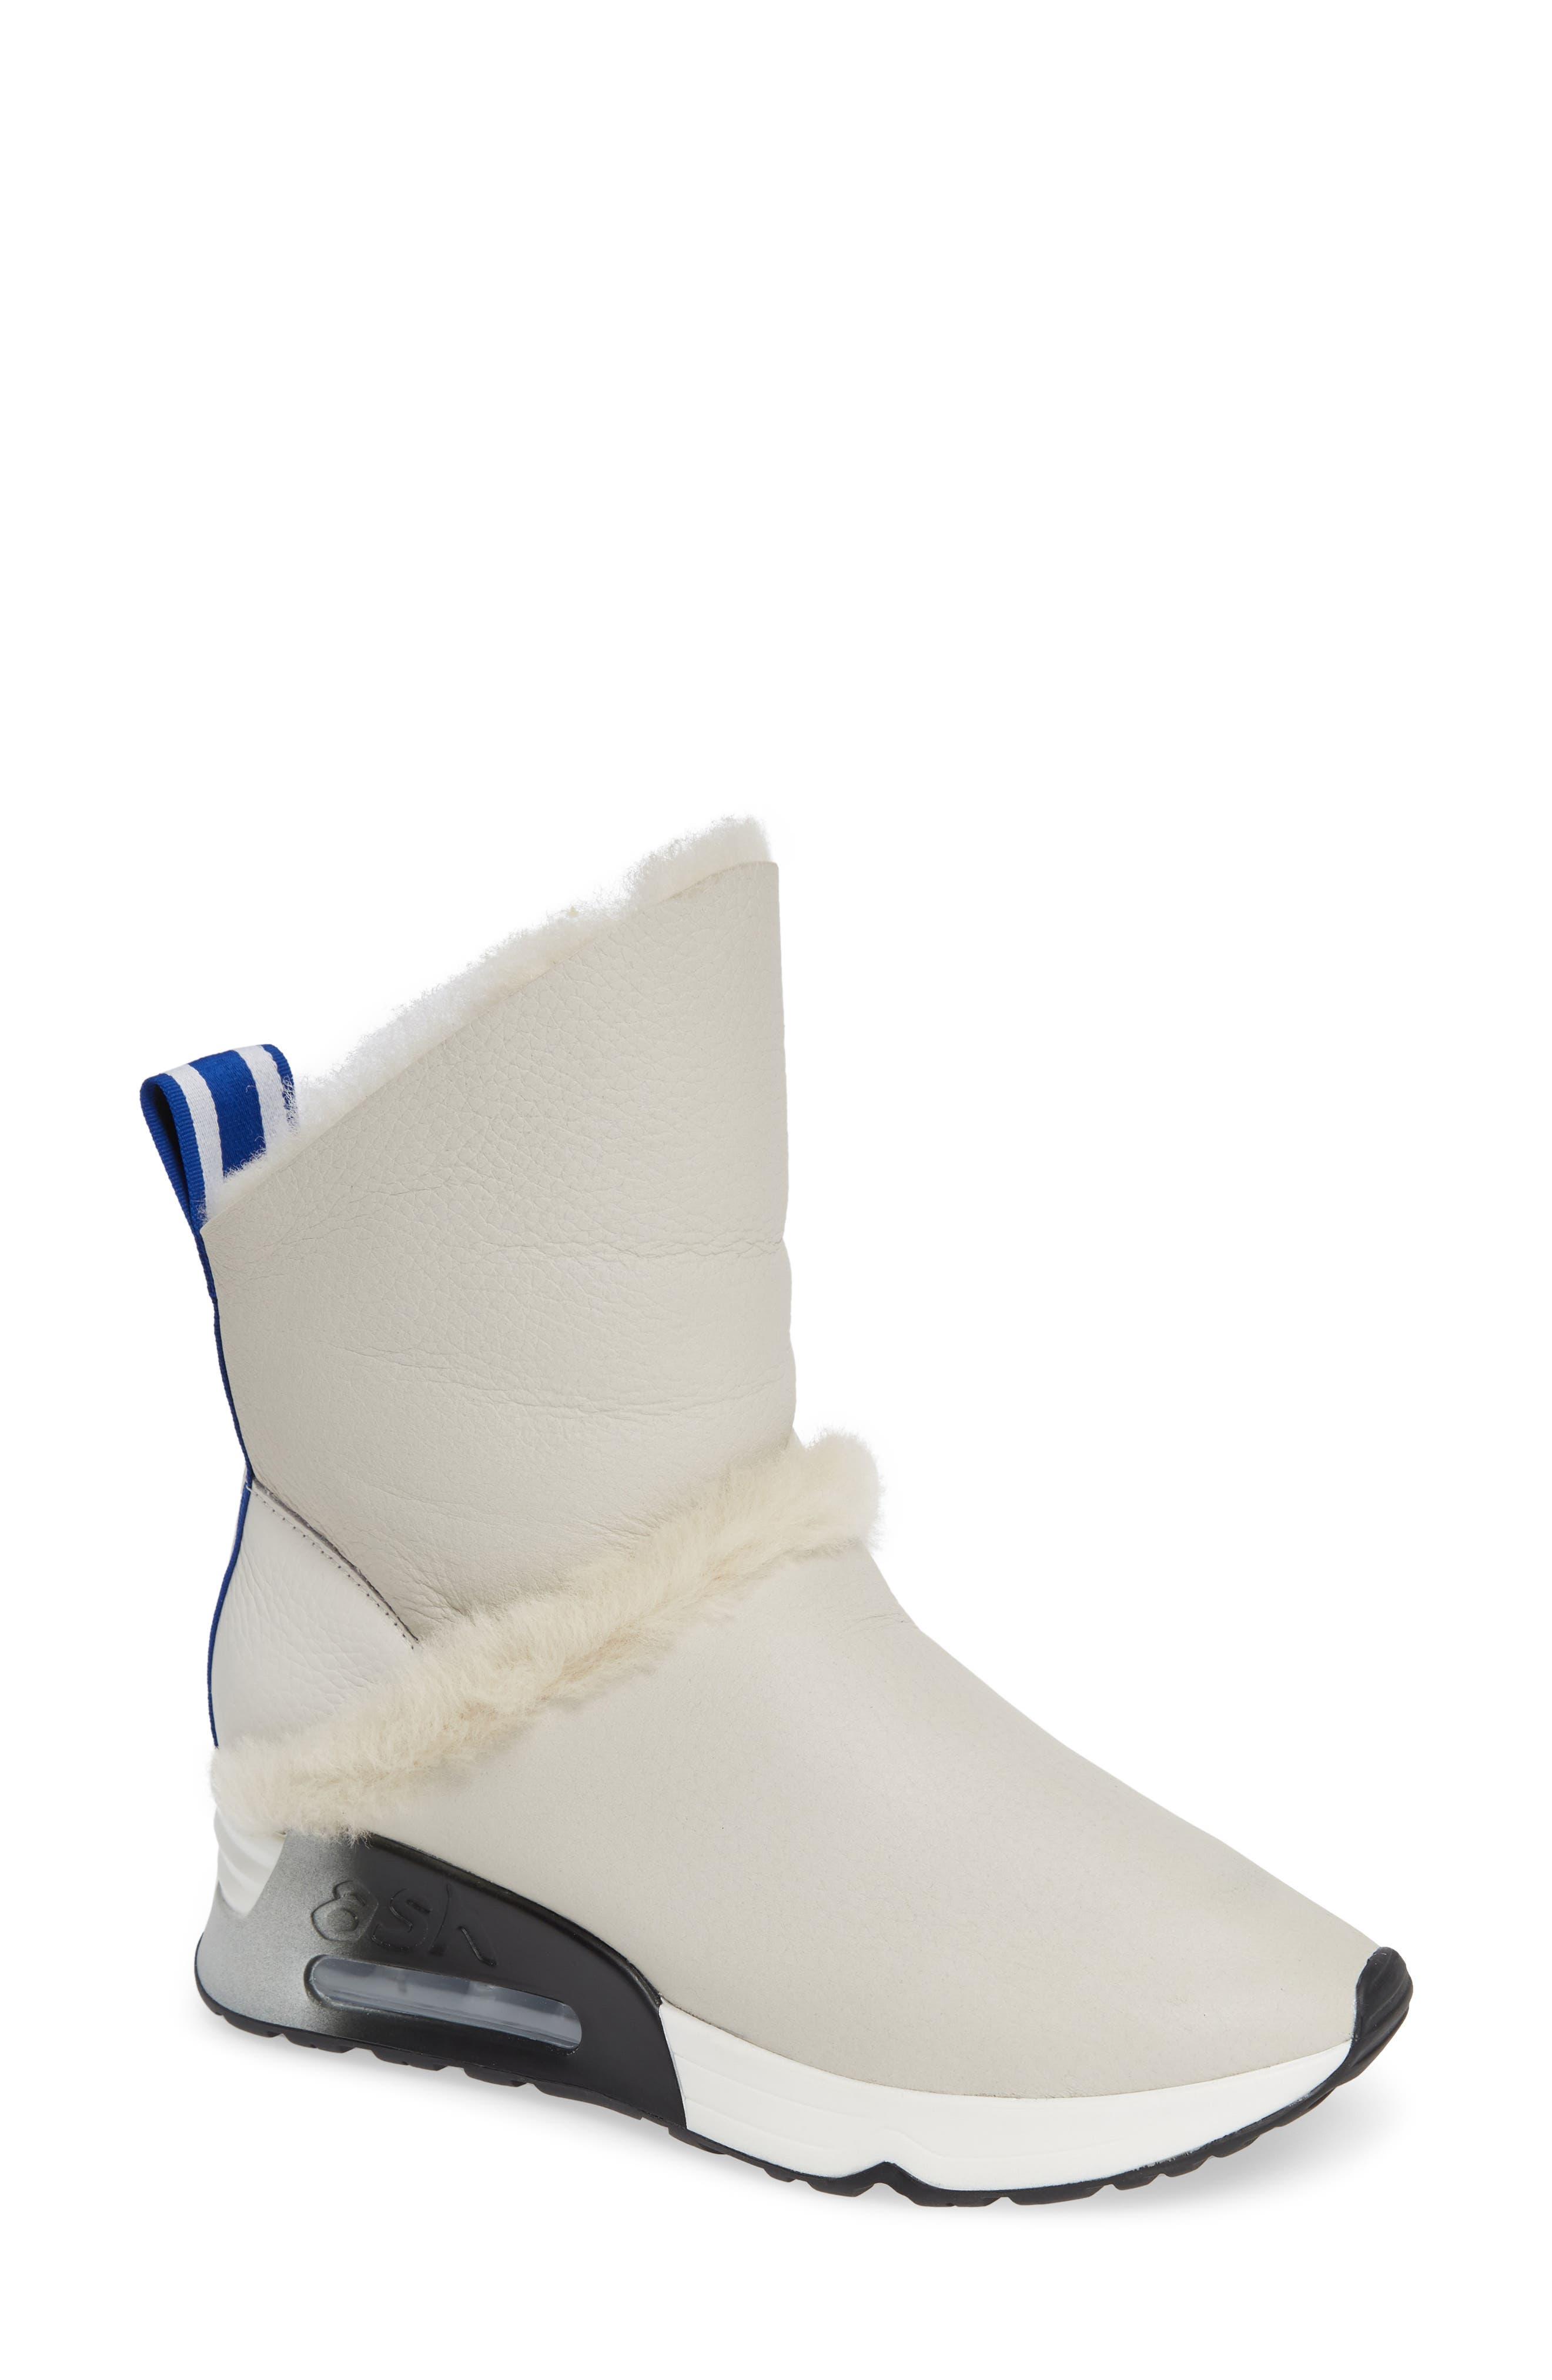 Laika Genuine Shearling Bootie in White/ Tumble Off White